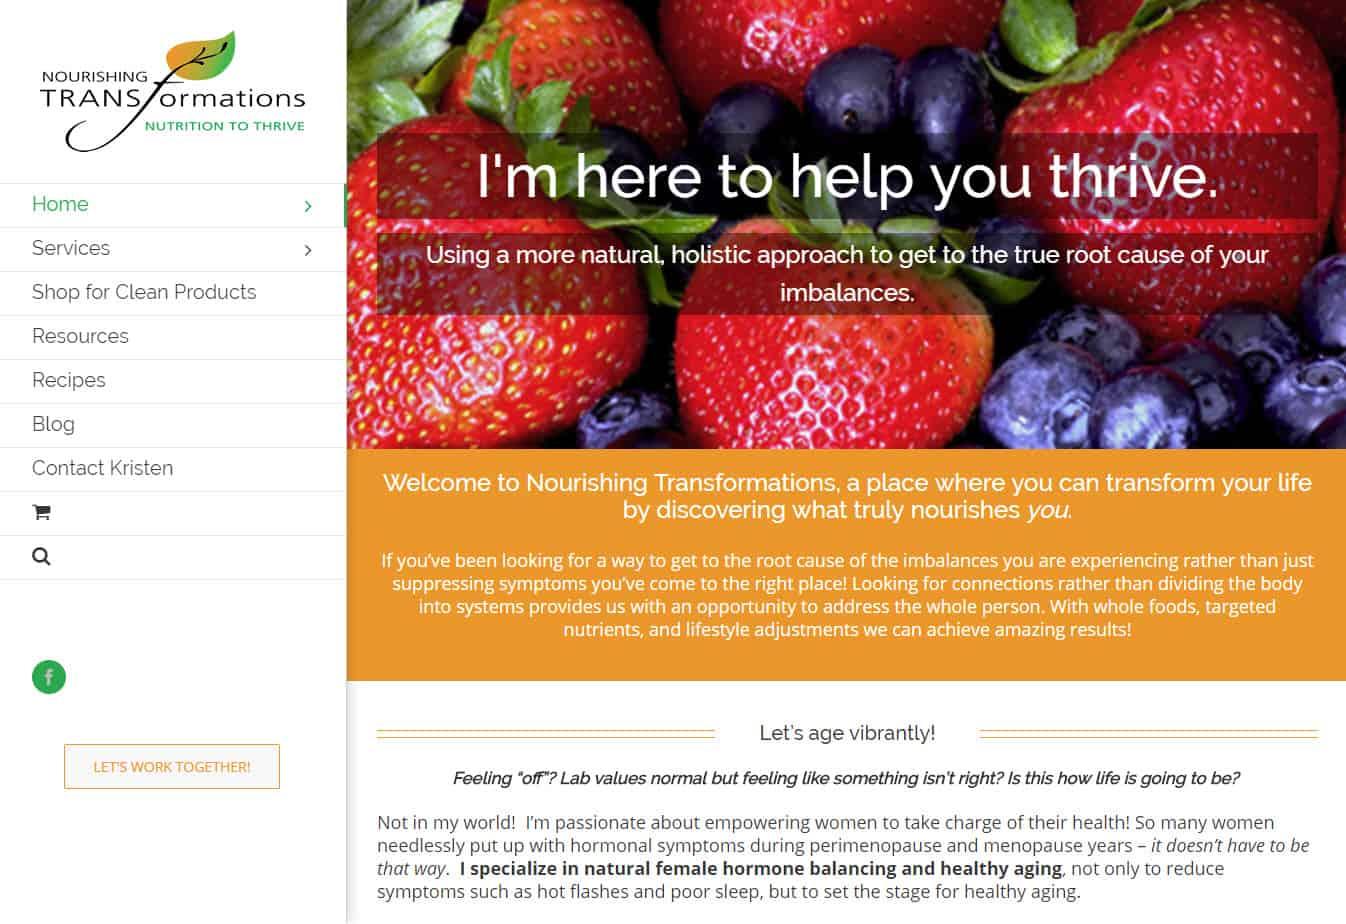 Nourishing Transformations site designed by CoBa Web Design